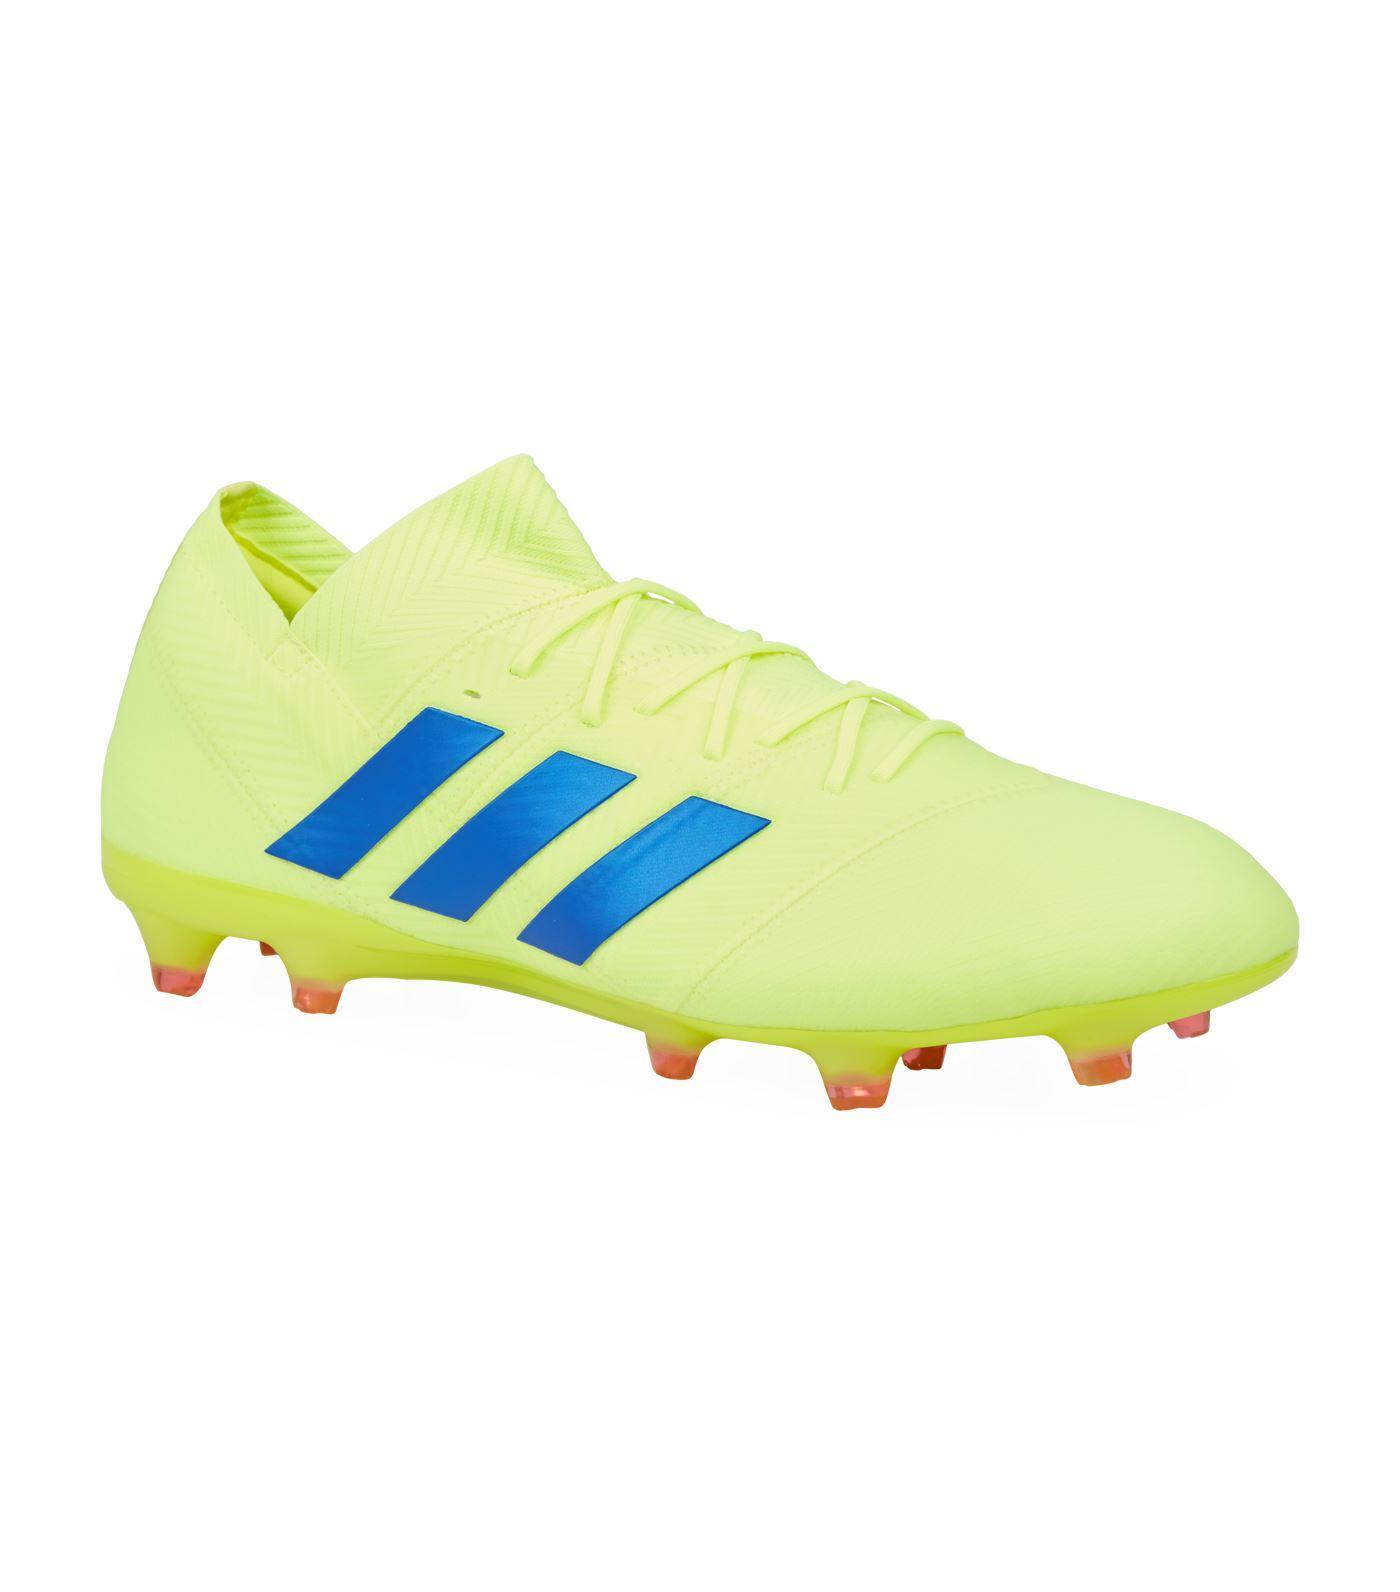 on sale 6a91b 6e5e7 adidas. Mens Yellow Nemeziz 18.1 Firm Ground Football Boots